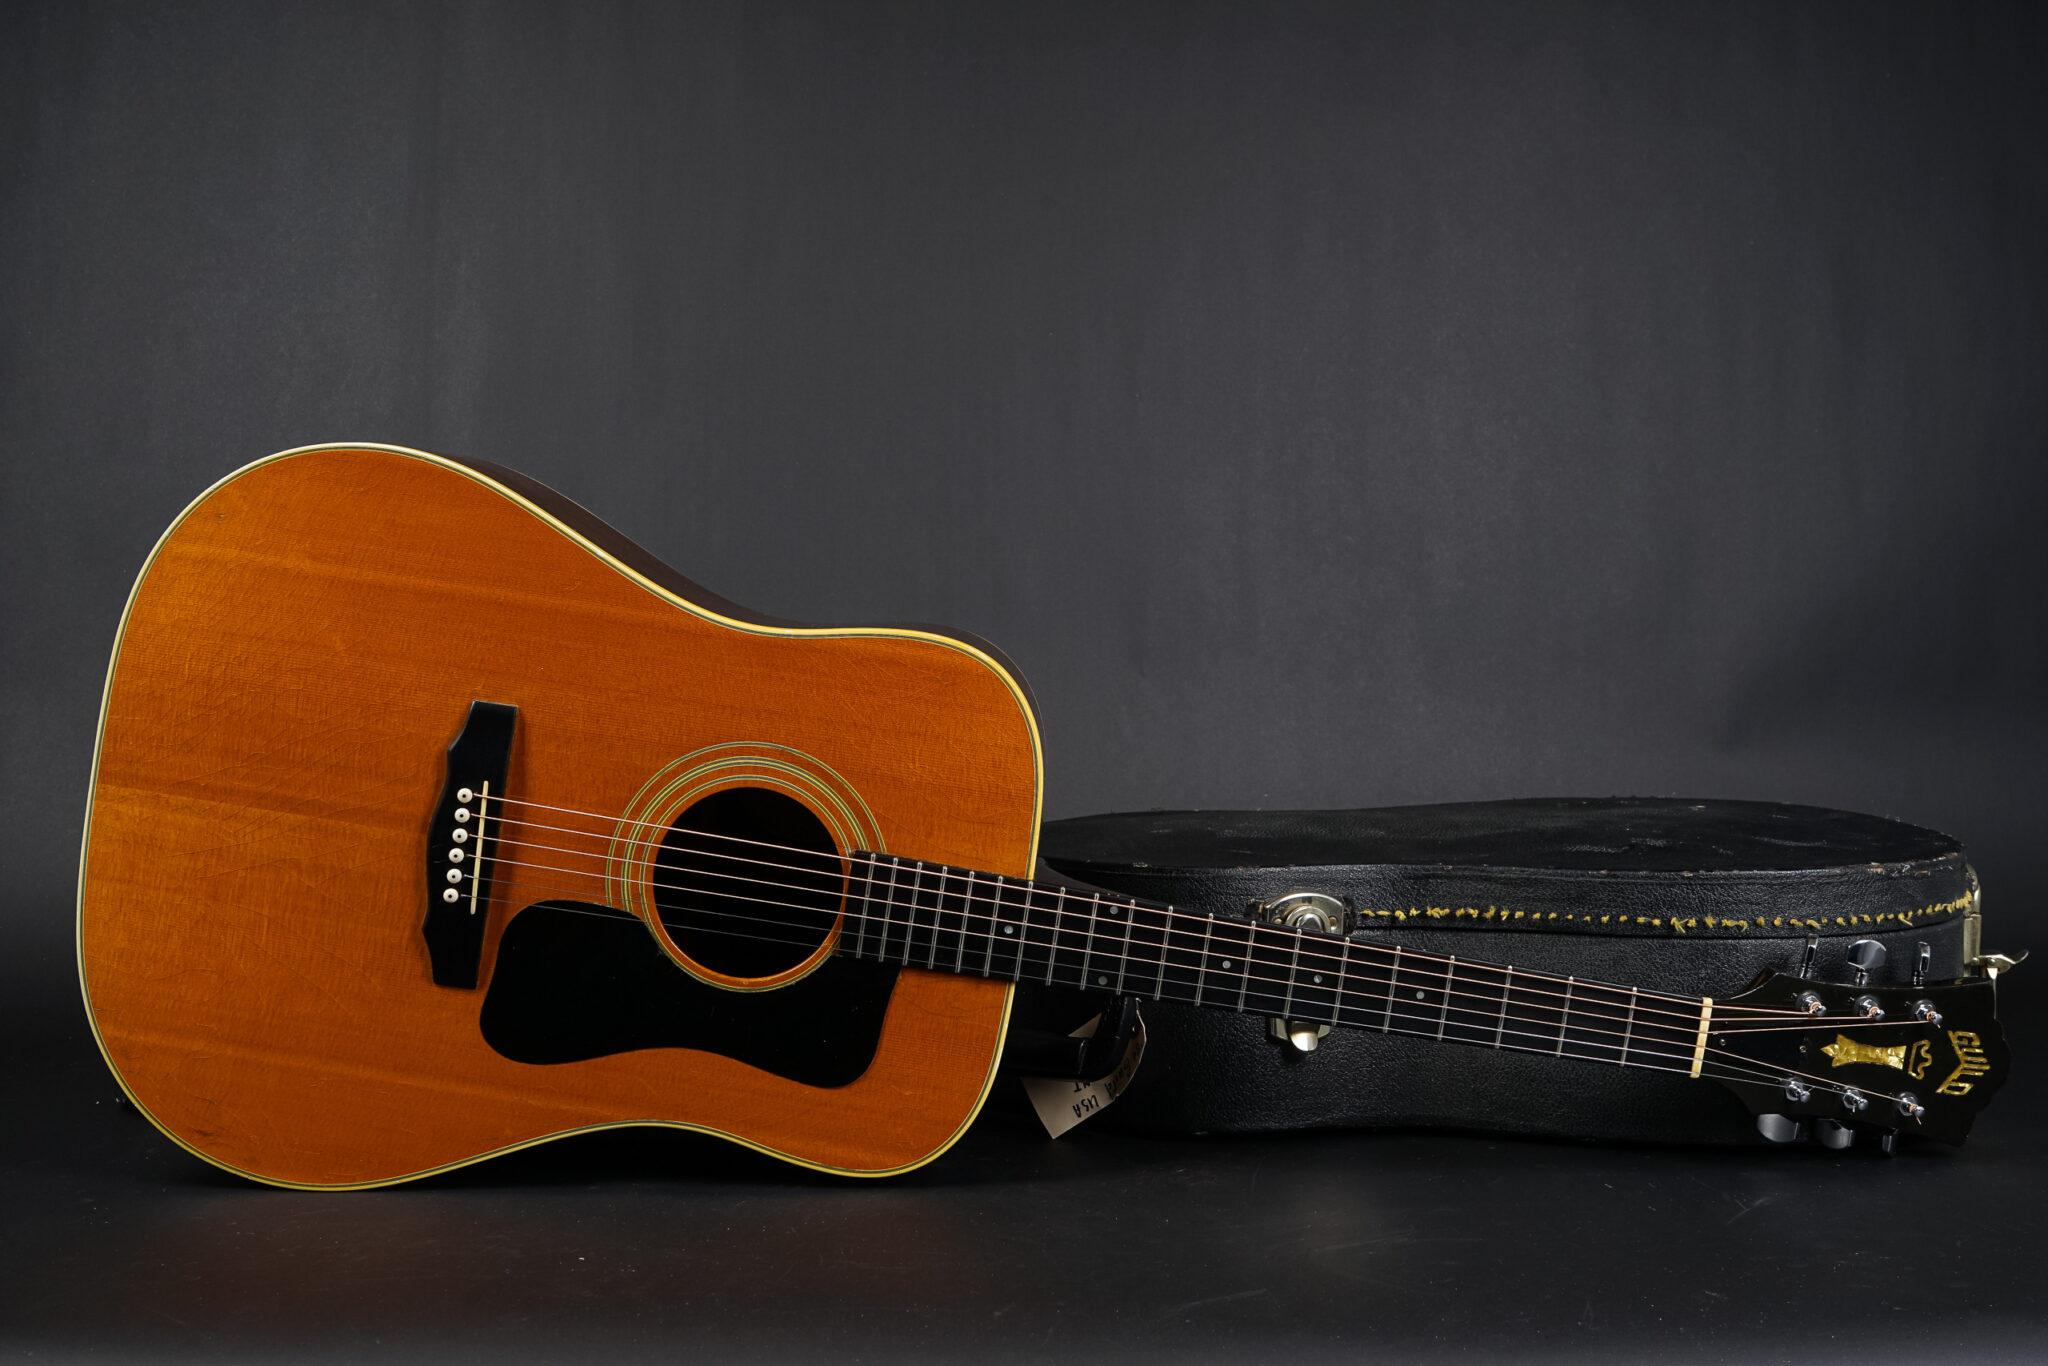 https://guitarpoint.de/app/uploads/products/1980-guild-d-50-natural/1980_Guild-D-50-Natural-6-2048x1366.jpg